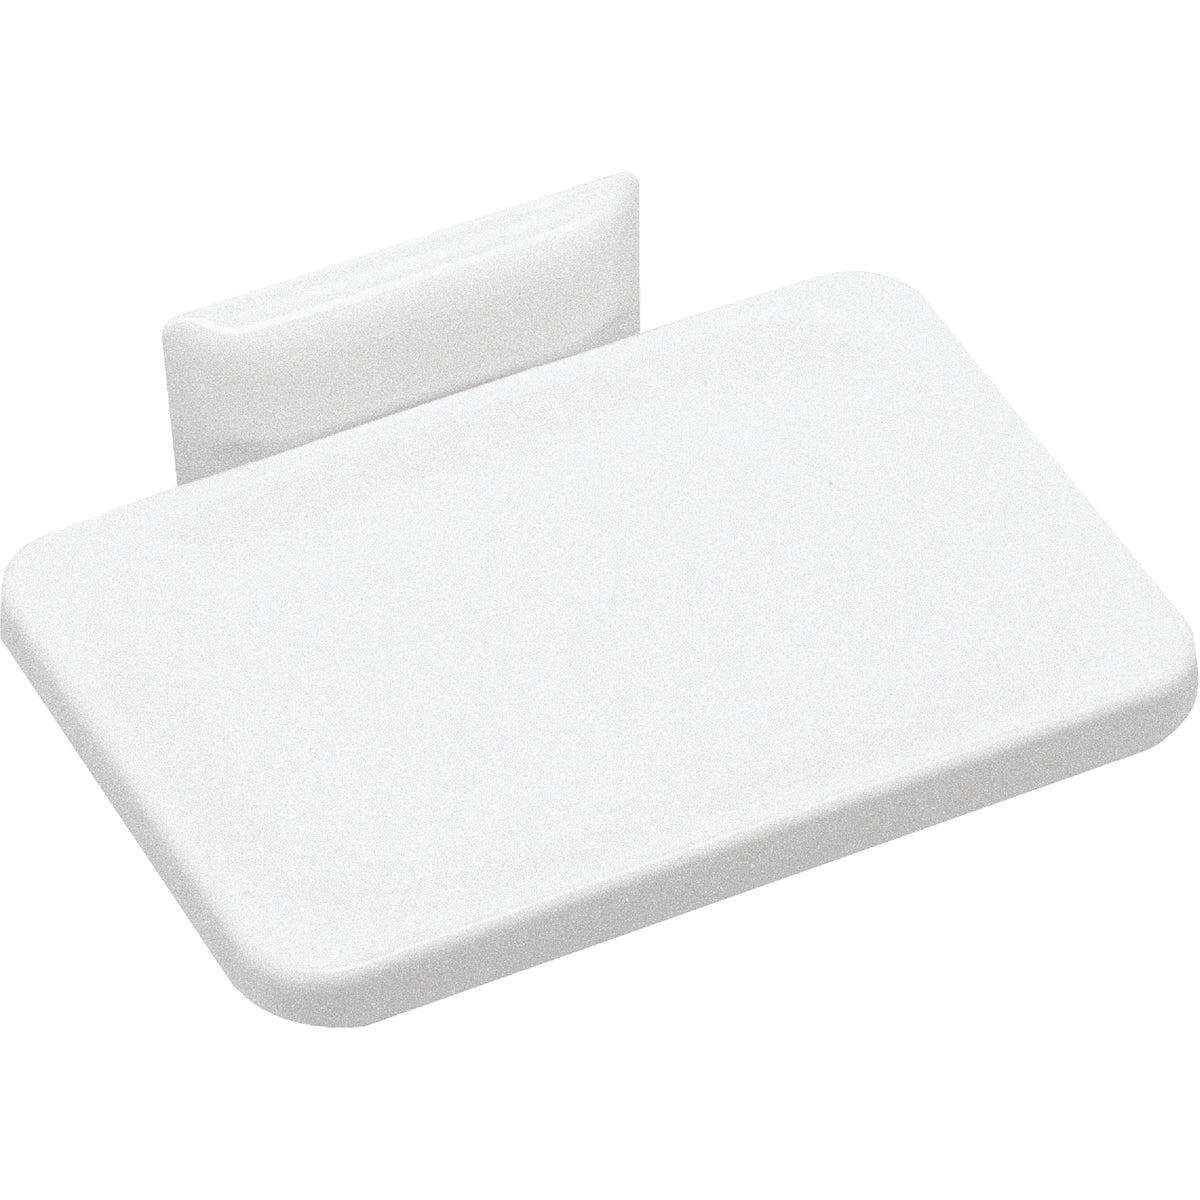 Wht Wall Mount Soap Dish